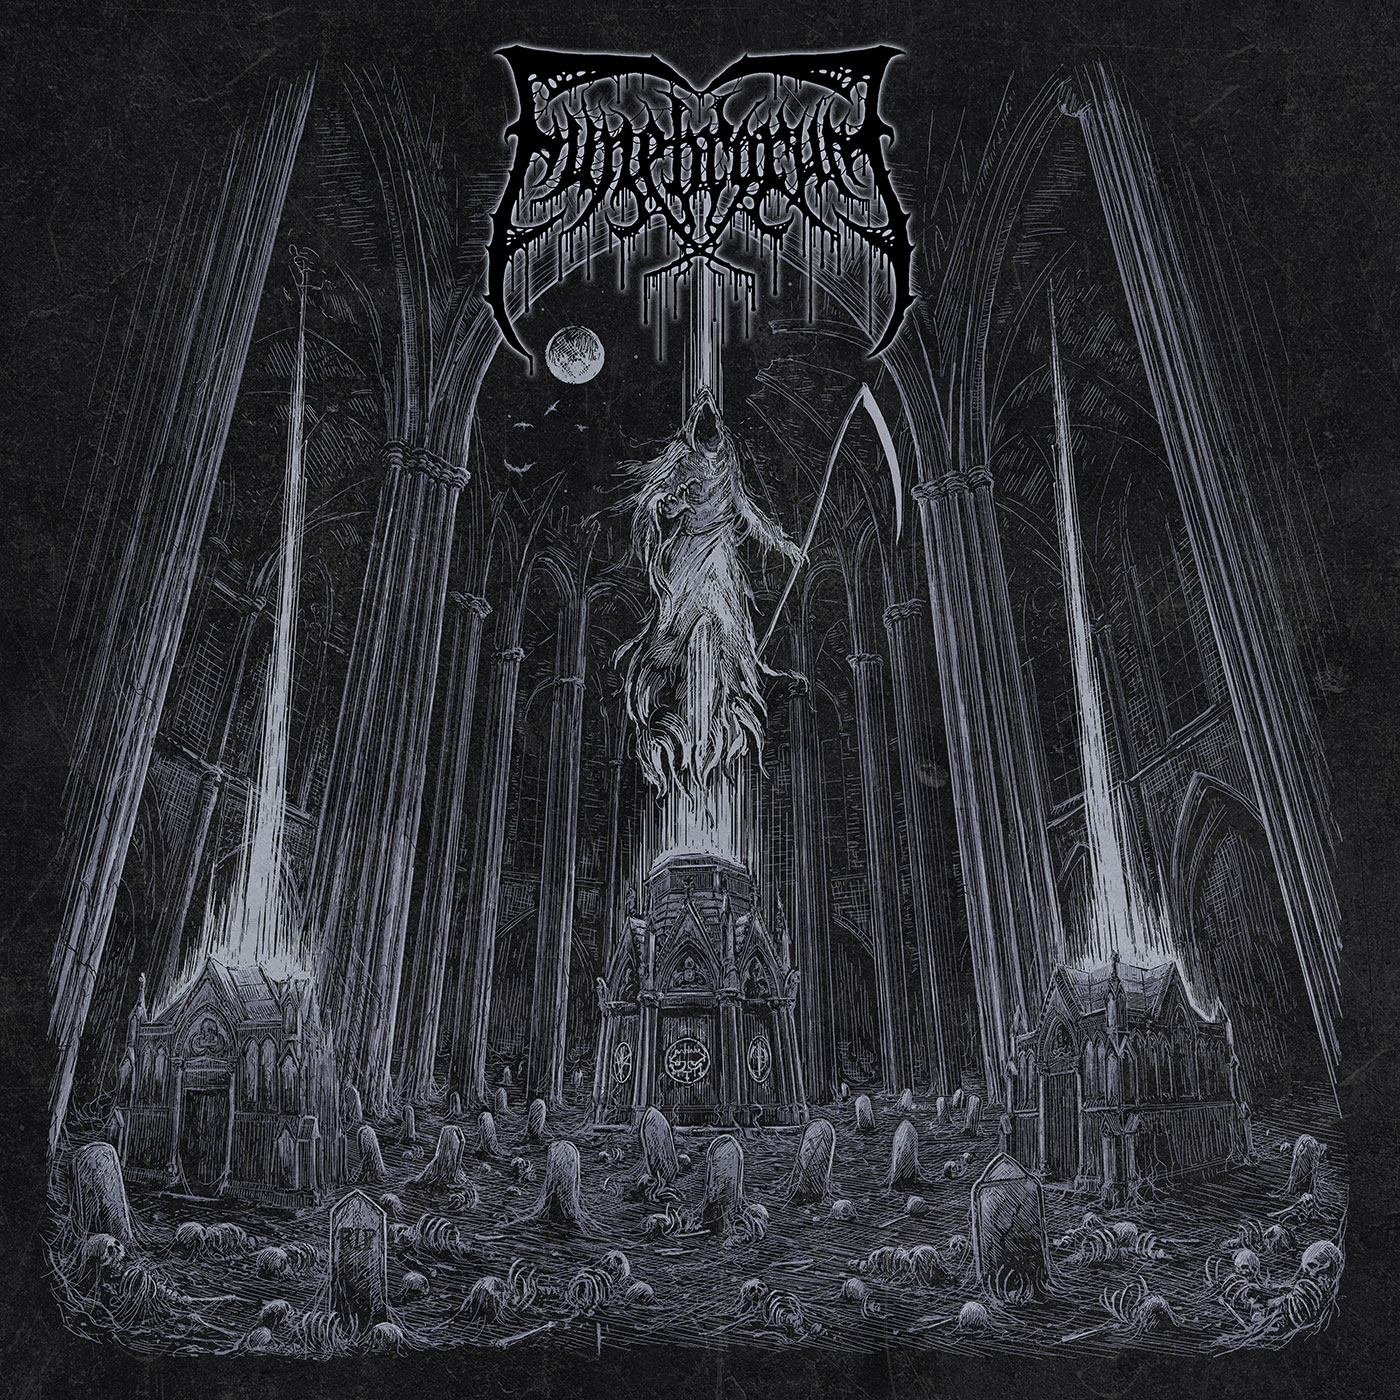 Funebrarum - Exhumation of the Ancient